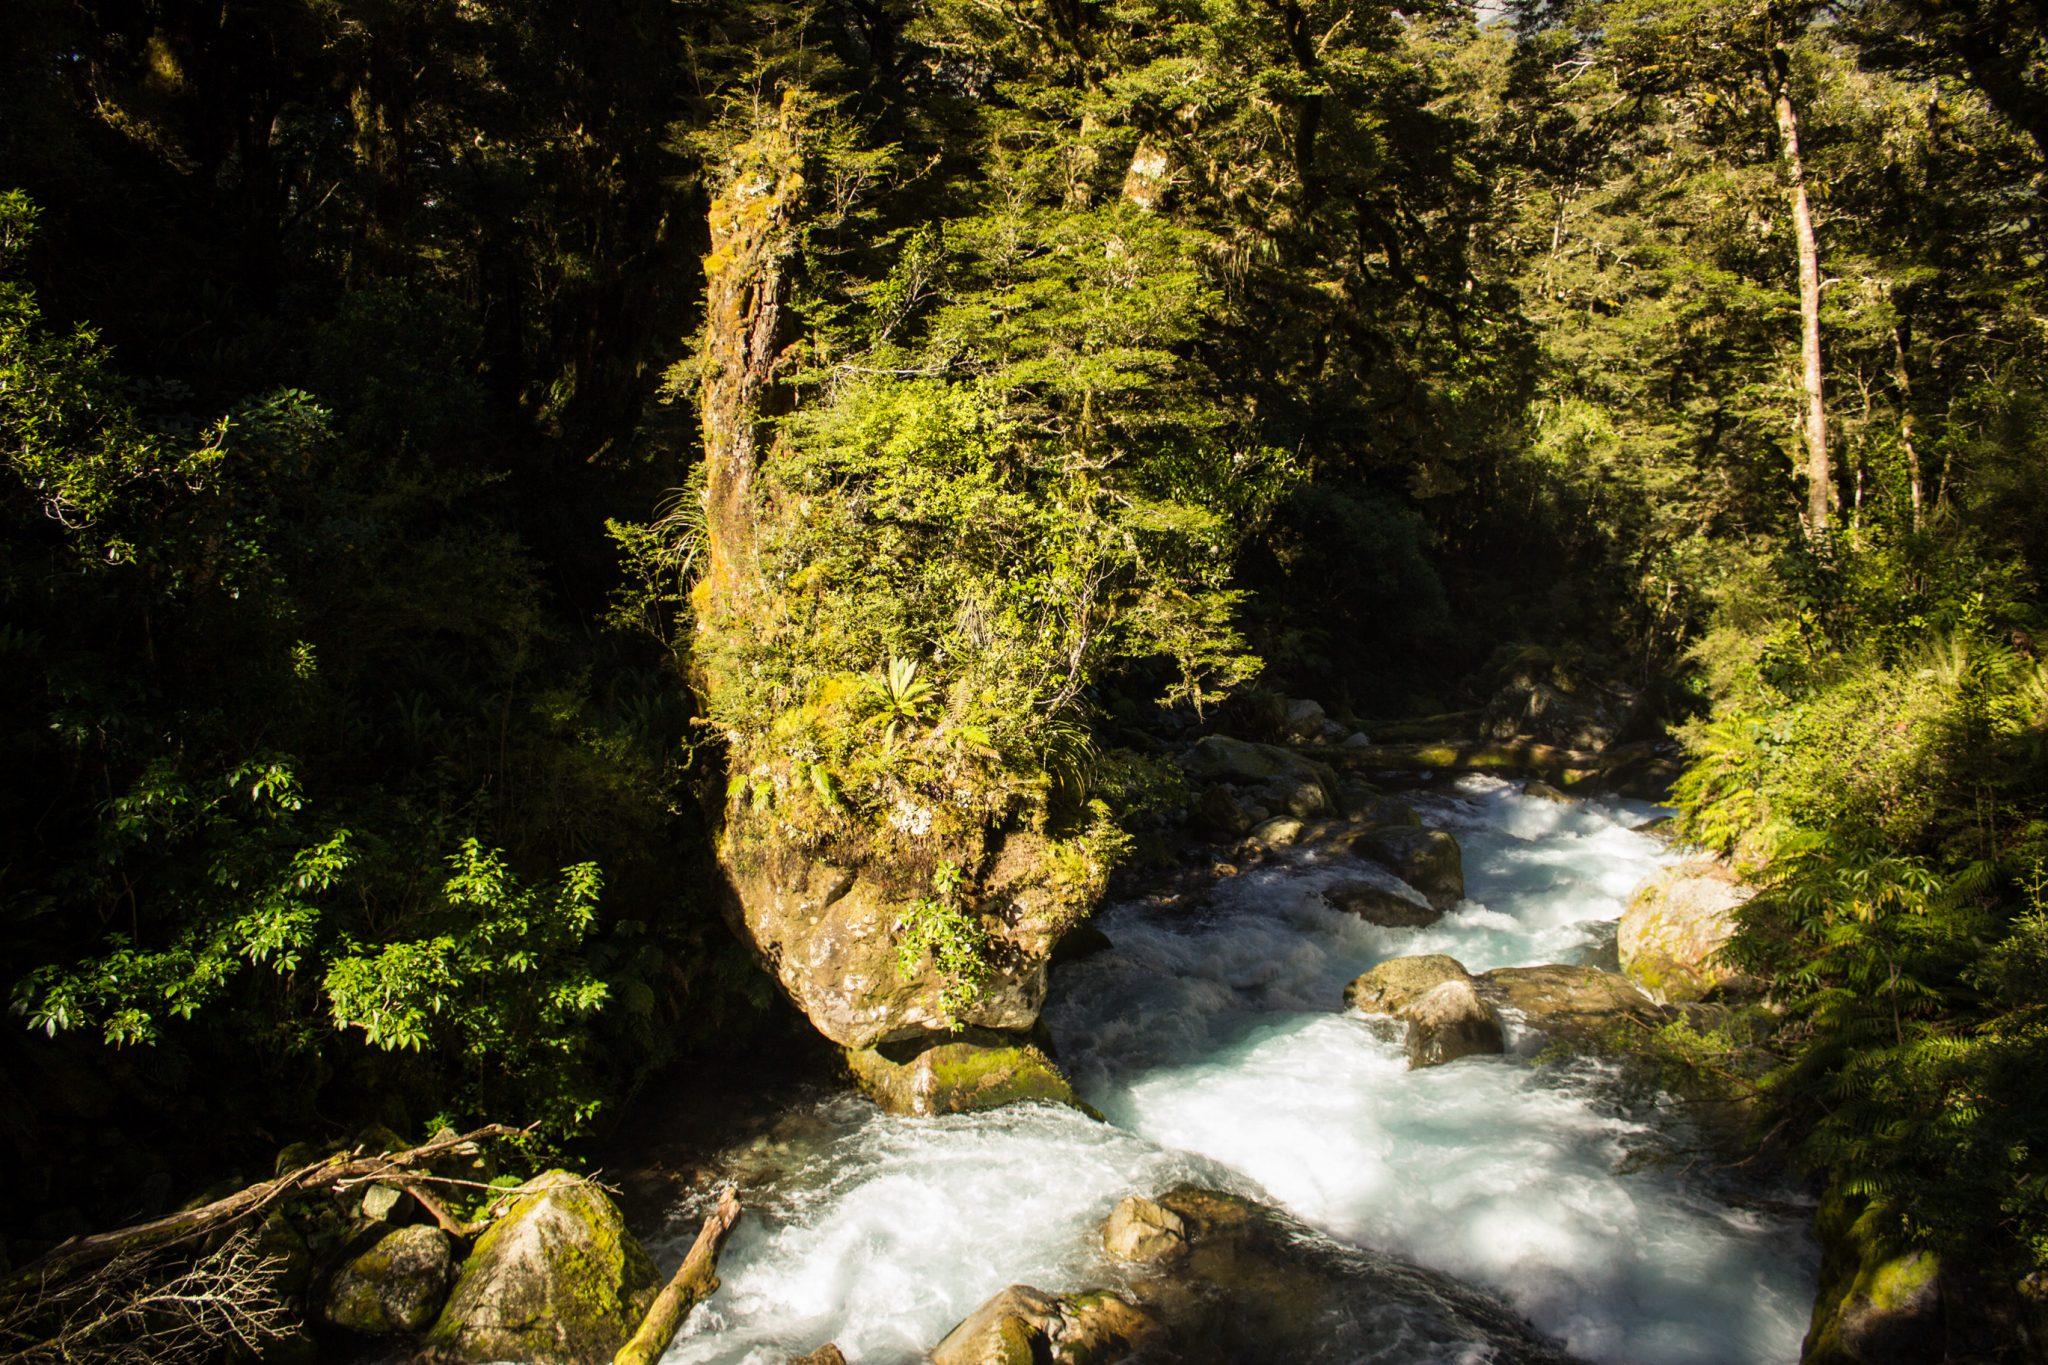 Lake Marian Track wandern, bei Marian Falls im Fiordland National Park Südinsel Neuseelands,dichter saftig grüner Wald, Farne, Wanderung zum See Marian, Wasserfall Marian Falls, schönes Licht, Sonne, Steine, großer Felsen, Moos